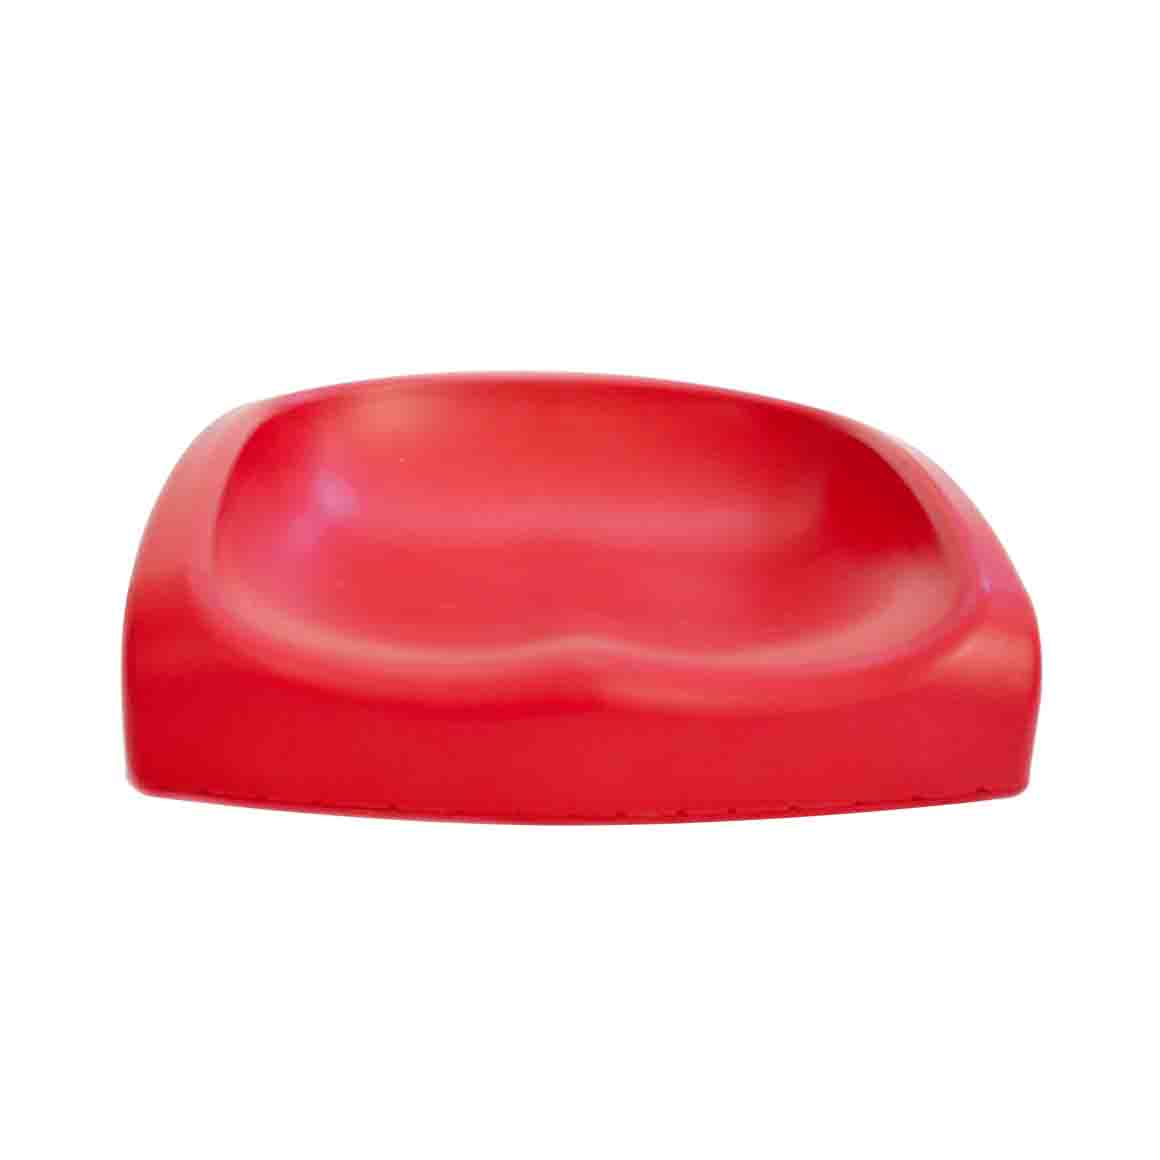 TooshCoosh Booster Seat - RED | Trada Marketplace